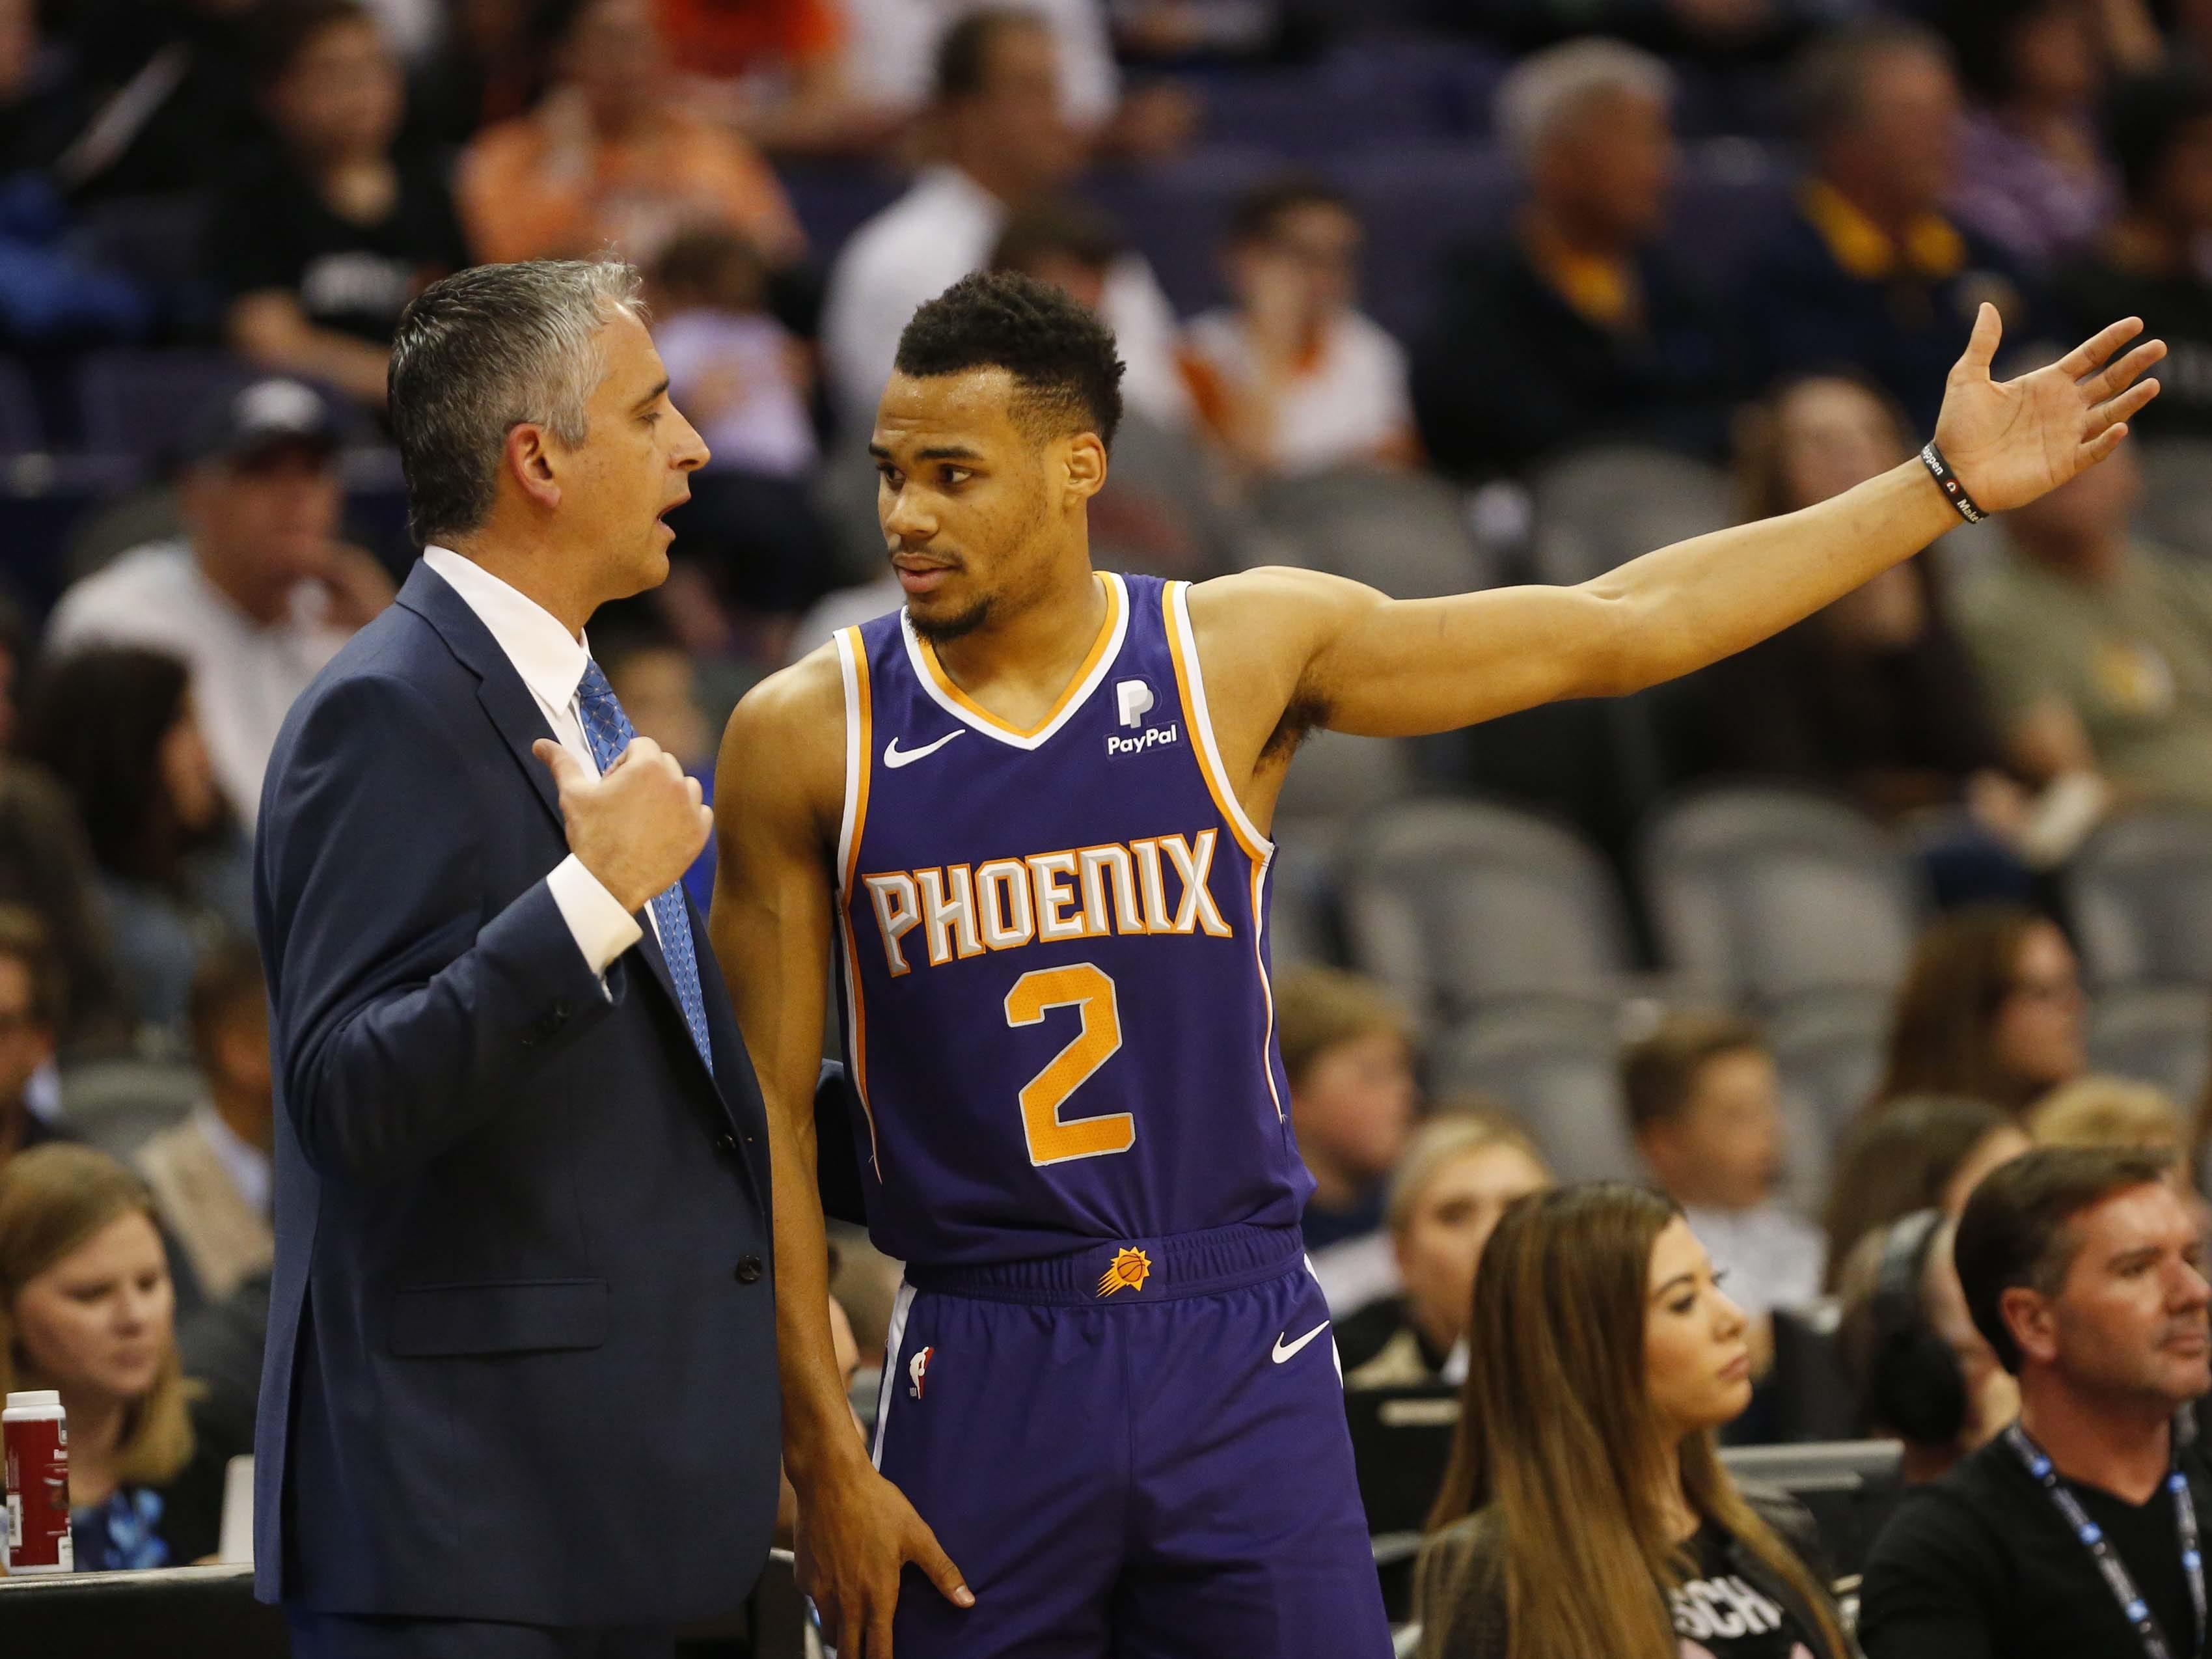 Phoenix Suns head coach Igor Kokoskov talks with Phoenix Suns guard Elie Okobo (2) during the second quarter against the Charlotte Hornets in Phoenix January 6, 2019.